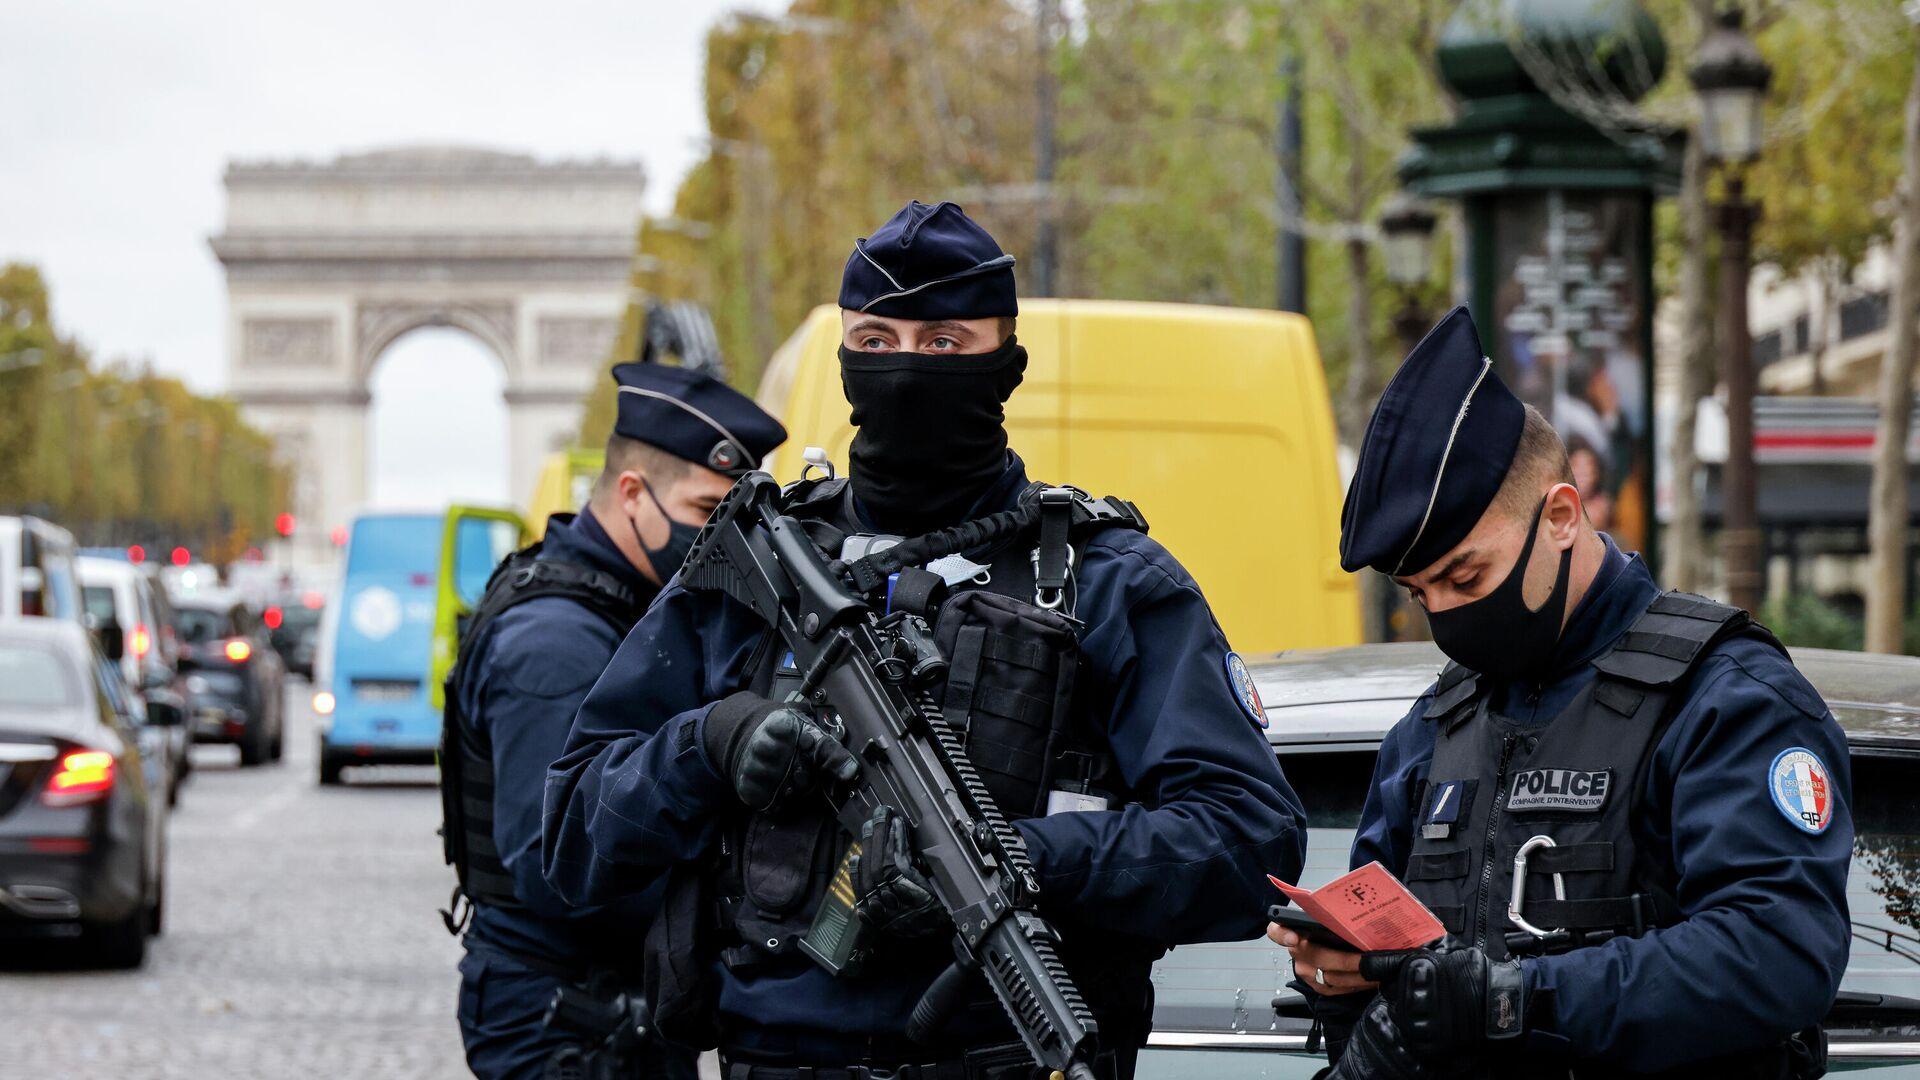 Французские полицейские в Париже - РИА Новости, 1920, 06.11.2020